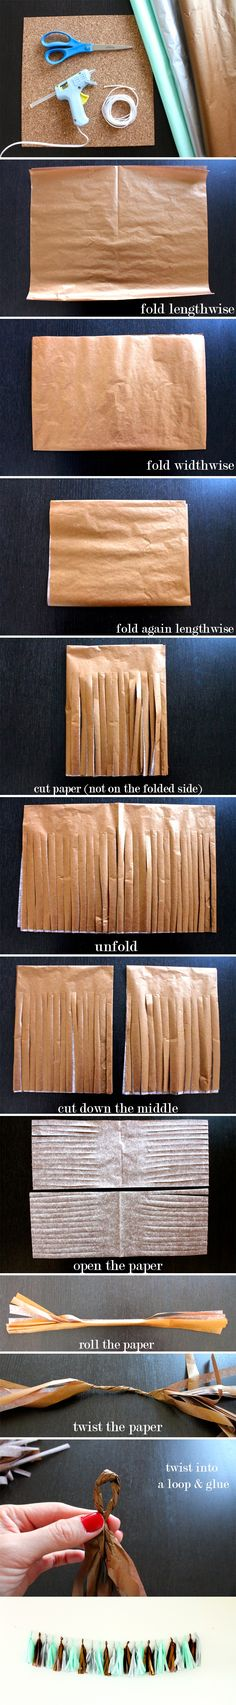 DIY : How to make a Tissue Paper Tassel Garland